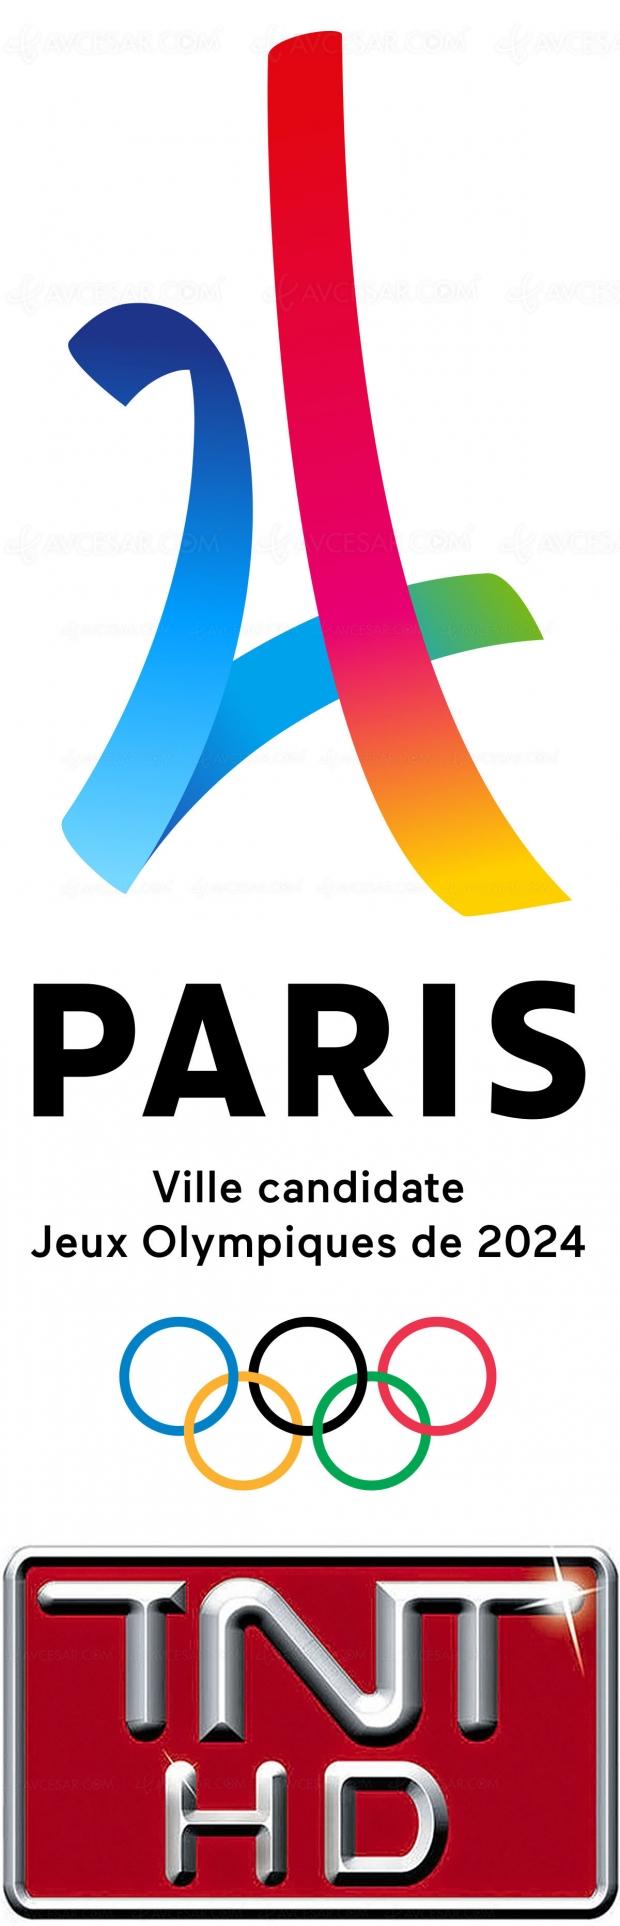 CSA, objectif TNT Ultra HD HDR avec DVB‑T2/HEVC pour les J.O de Paris 2024